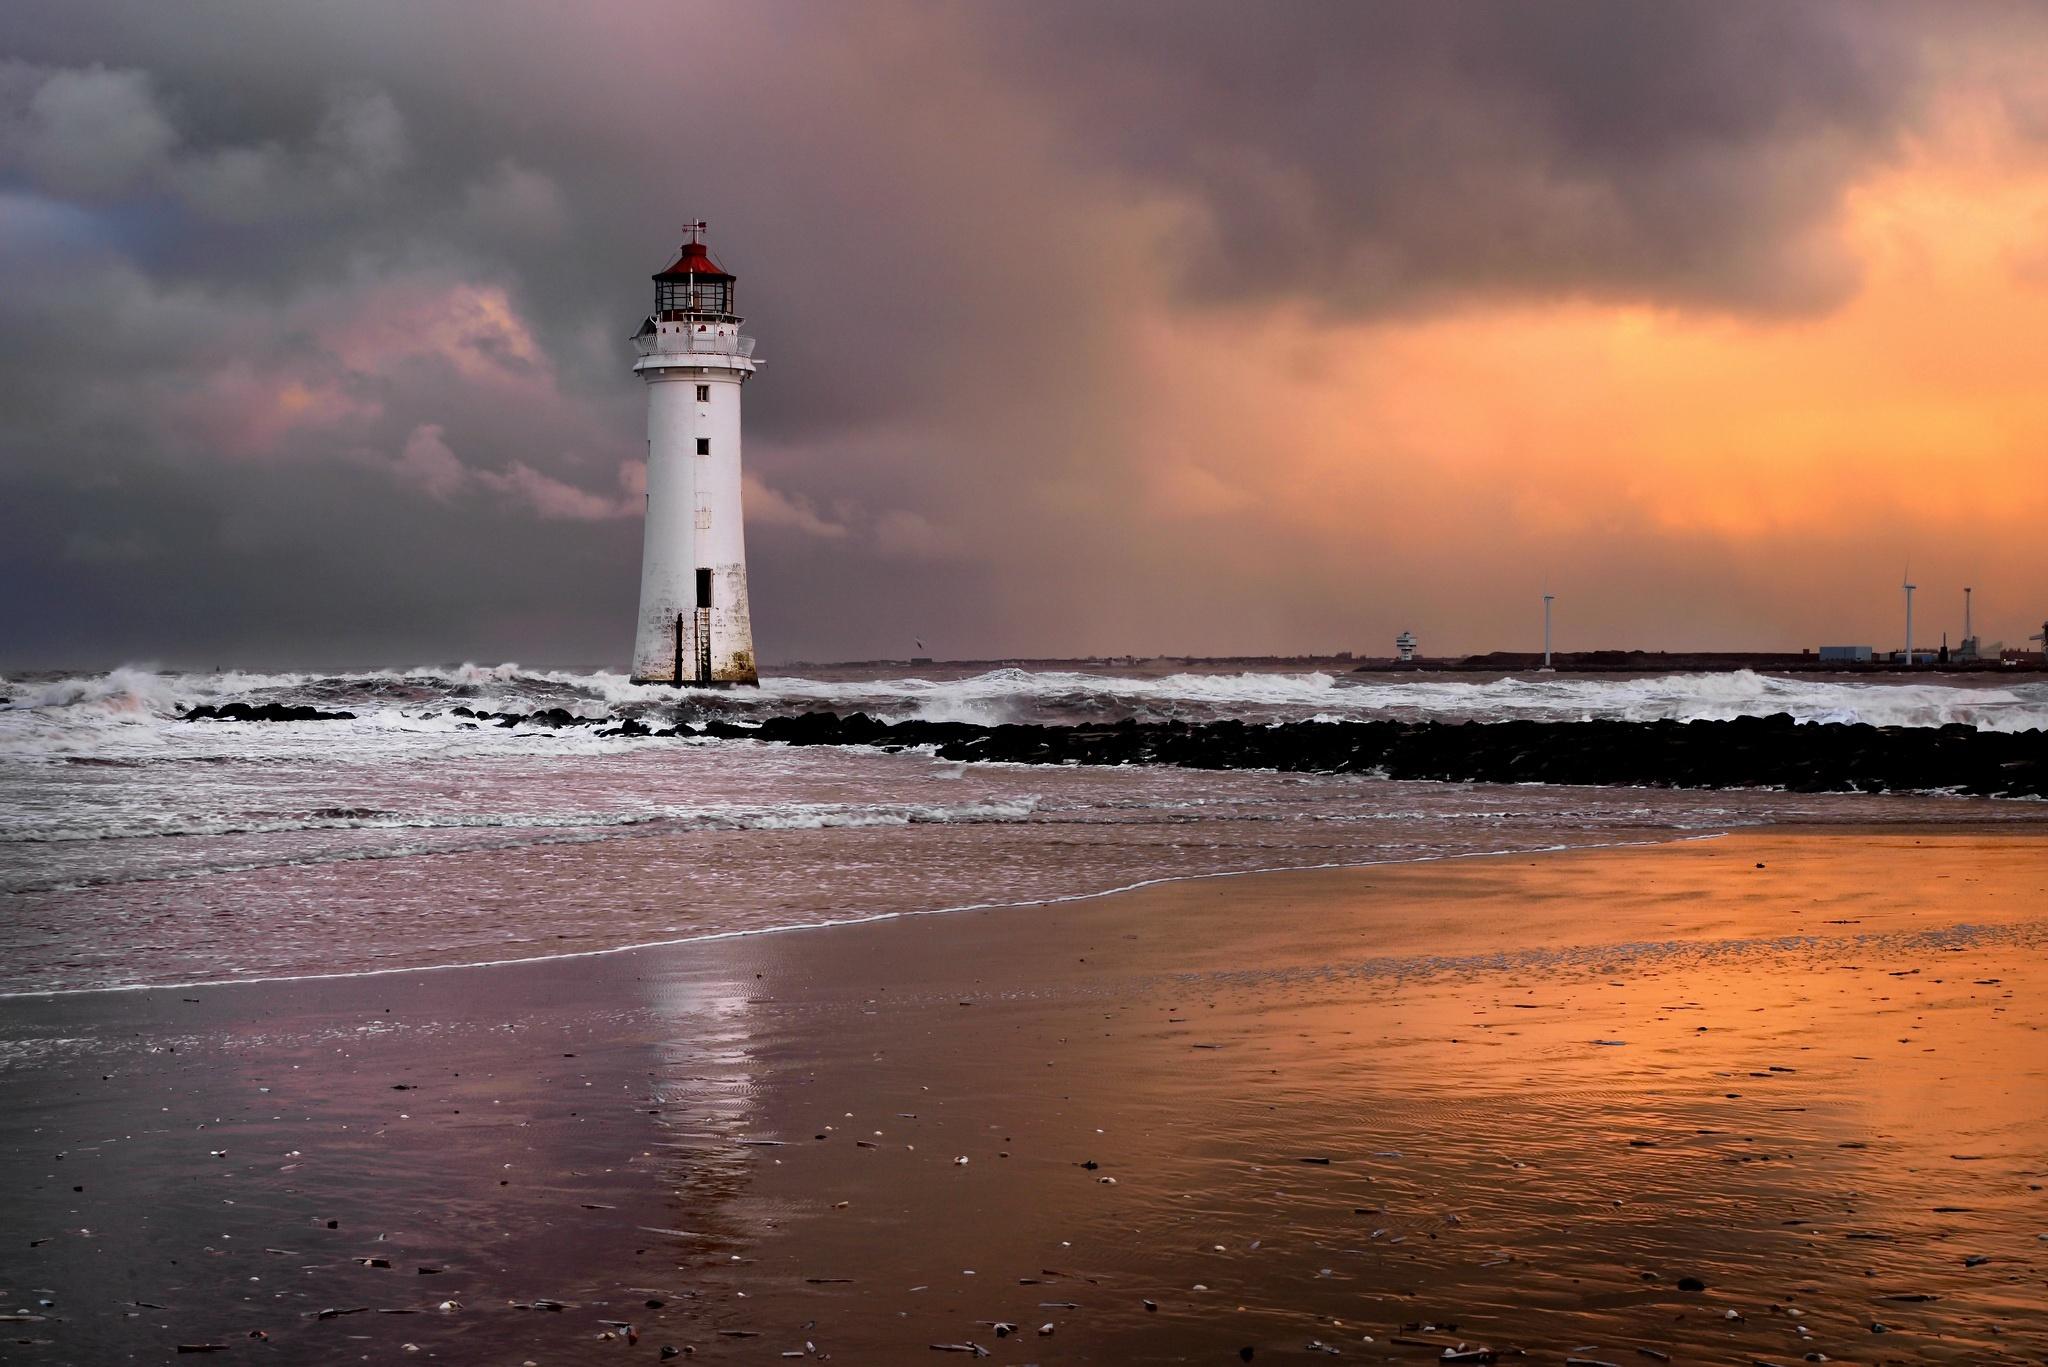 ашмариной маяк на берегу моря фото лист доставка